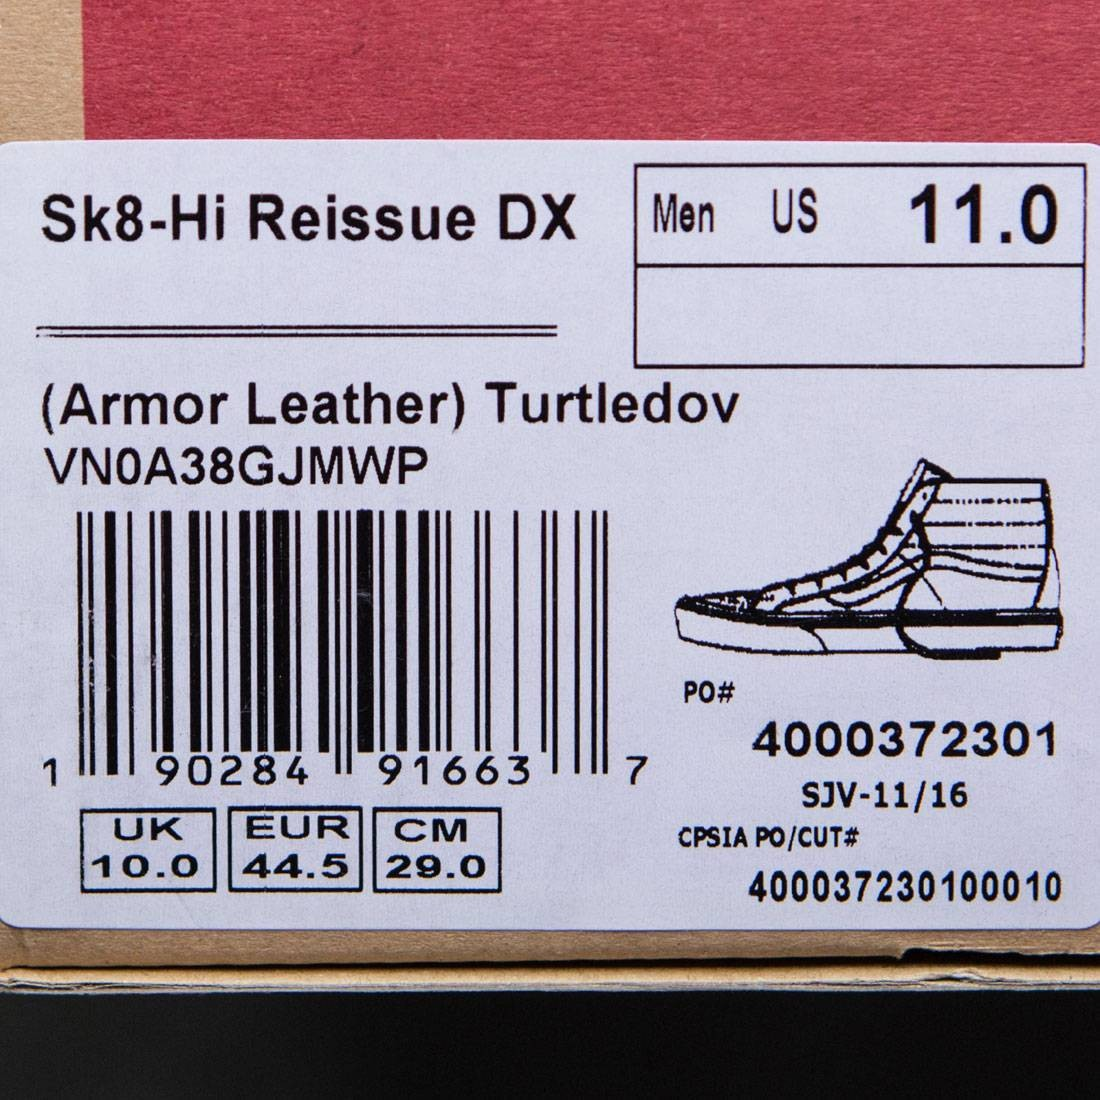 5fd09a7443c2f2 Vans Men Sk8-Hi Reissue DX - Armor Leather (white   turtledove)